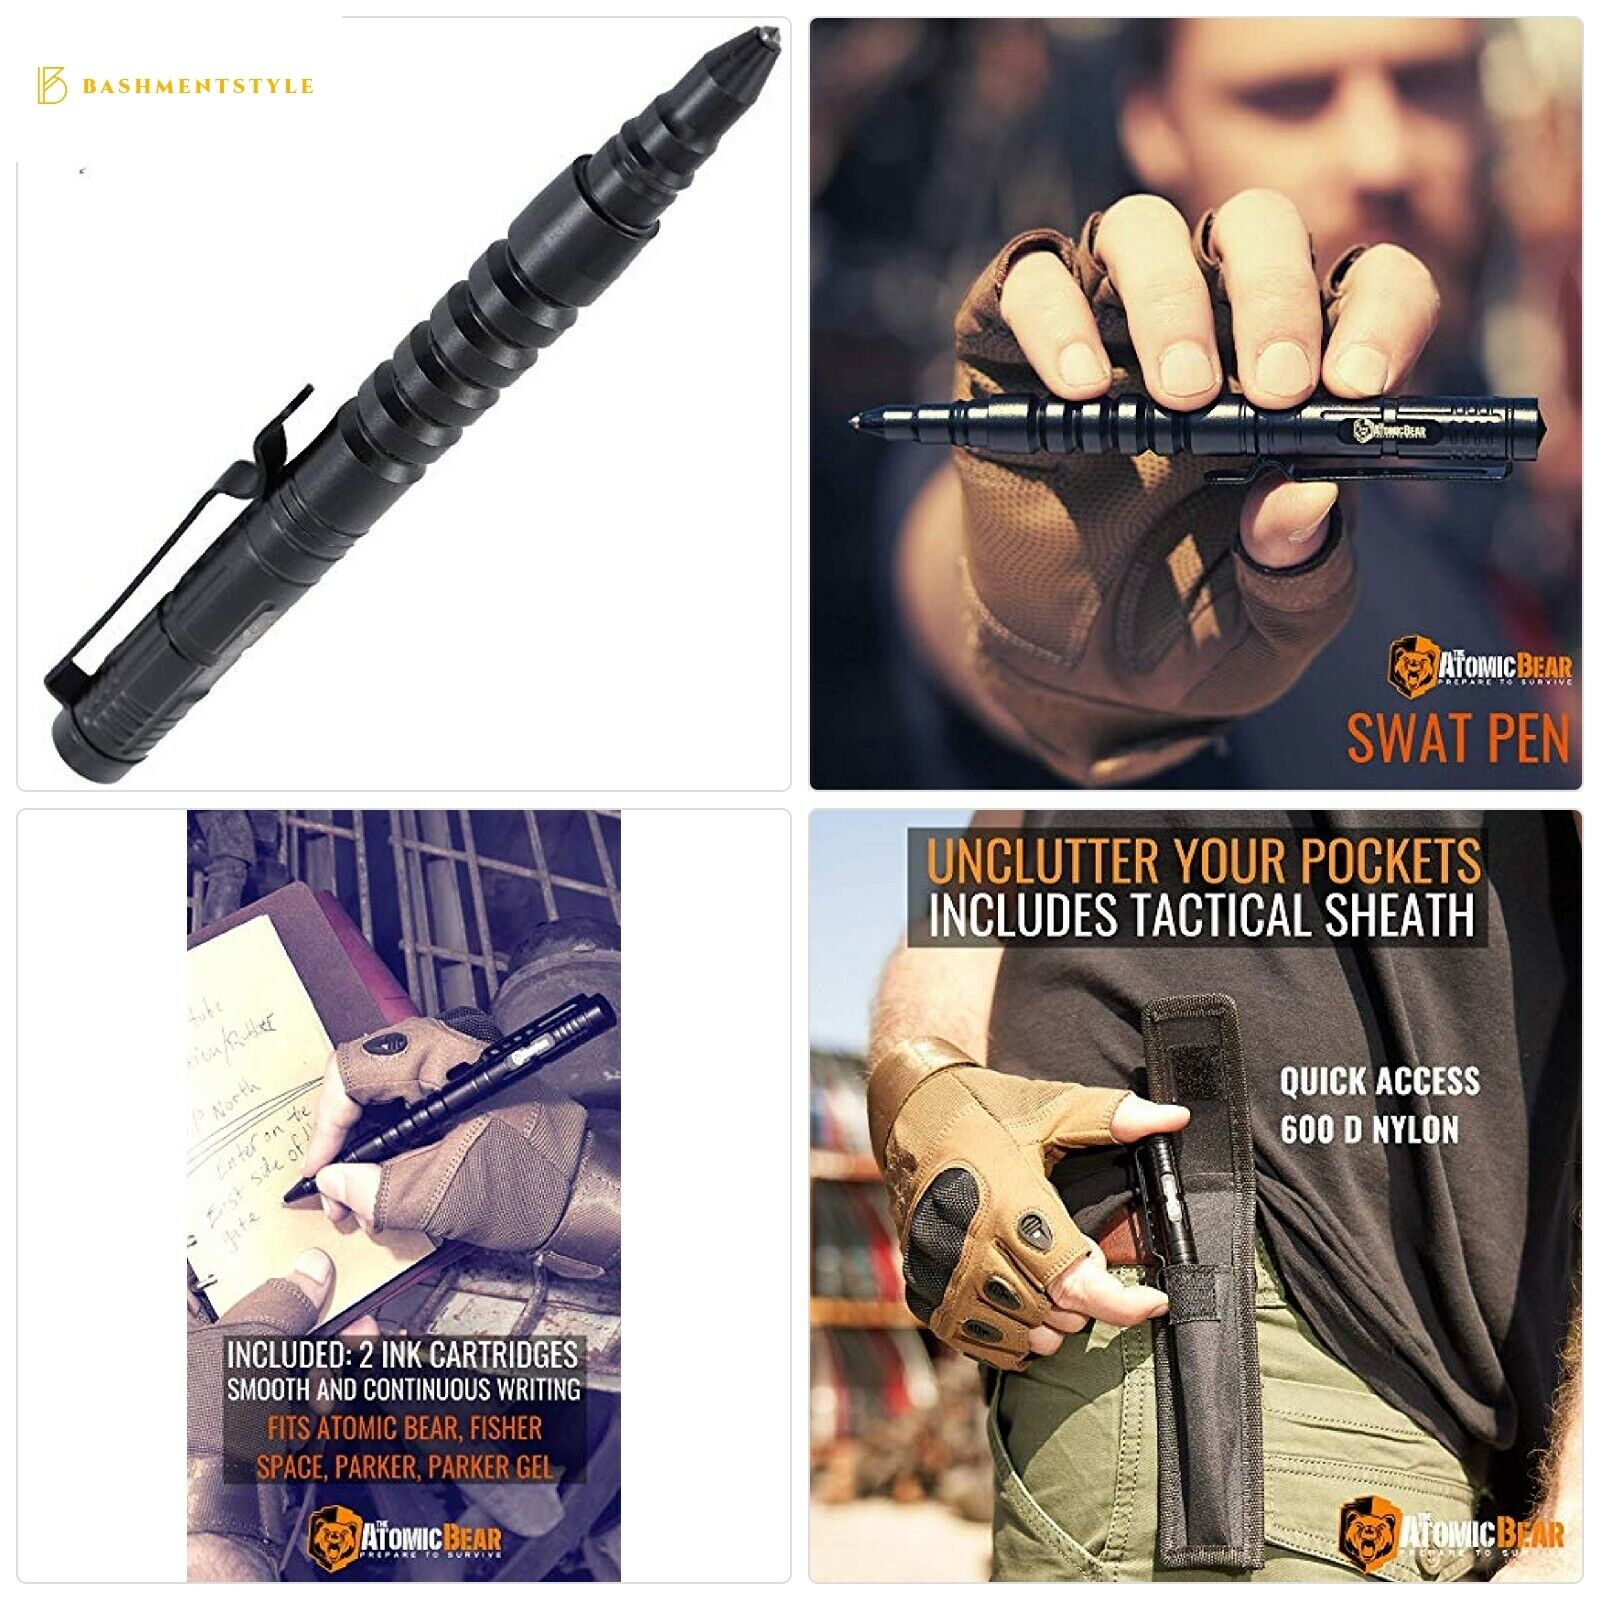 The Atomic Bear Tactical Pen - Self Defense Pen and Window B